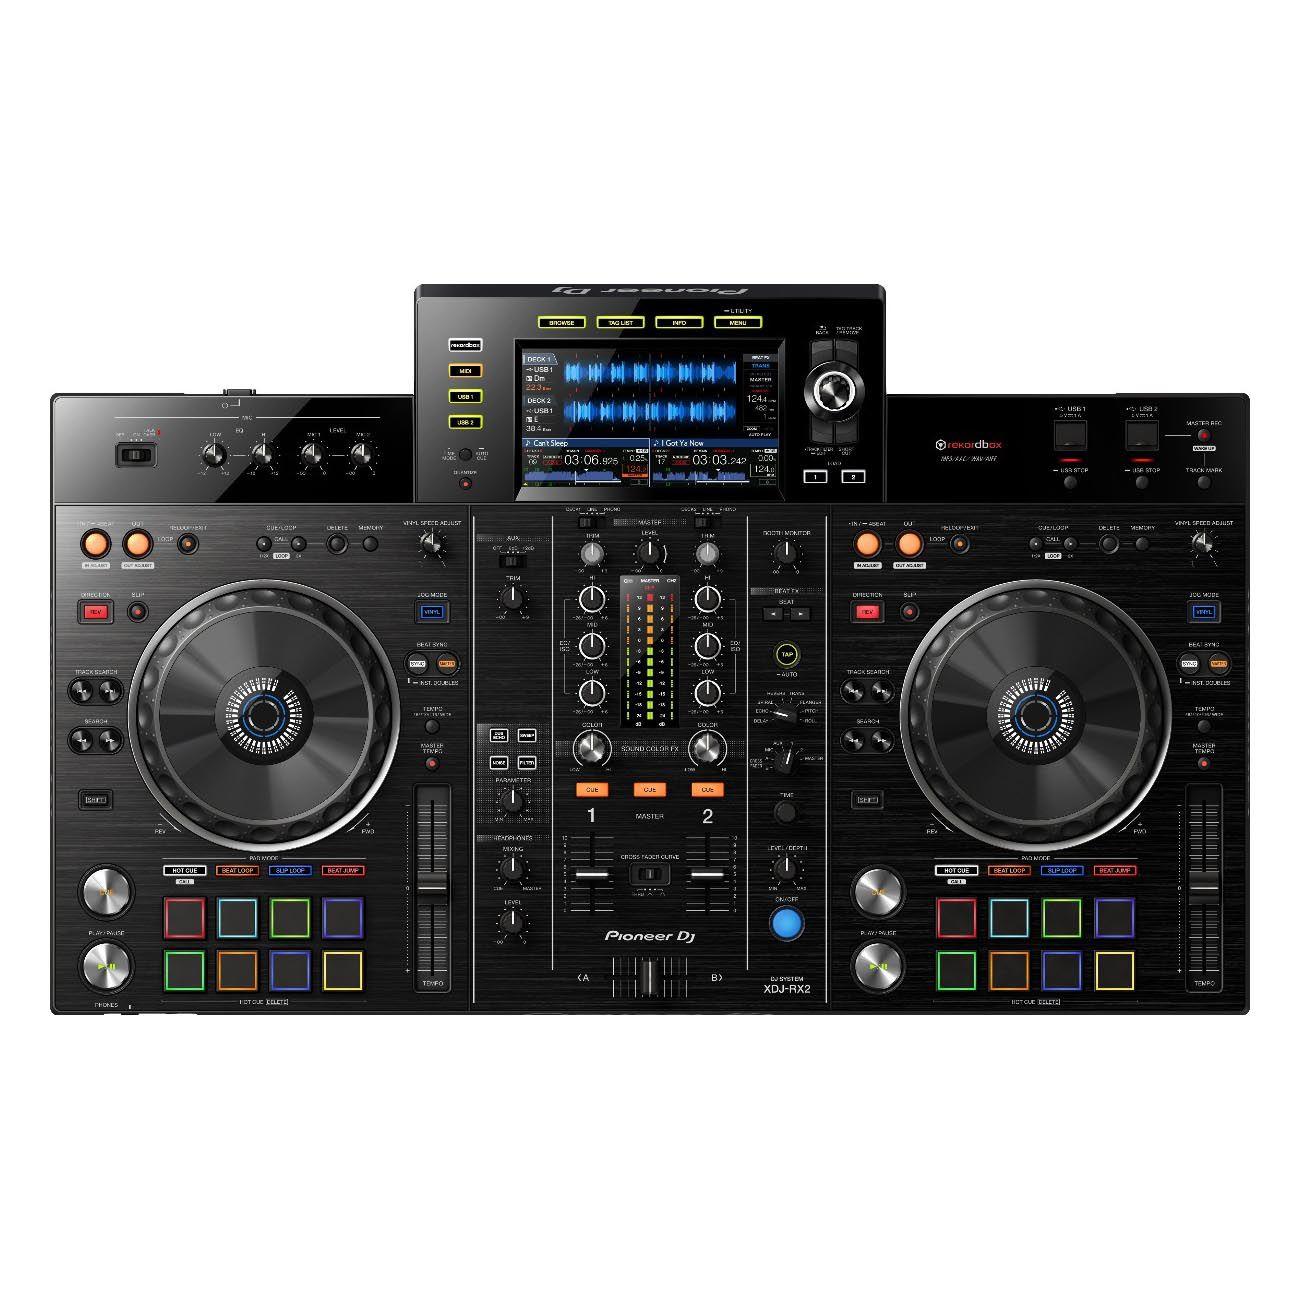 Controladora Pioneer DJ XDJ RX2